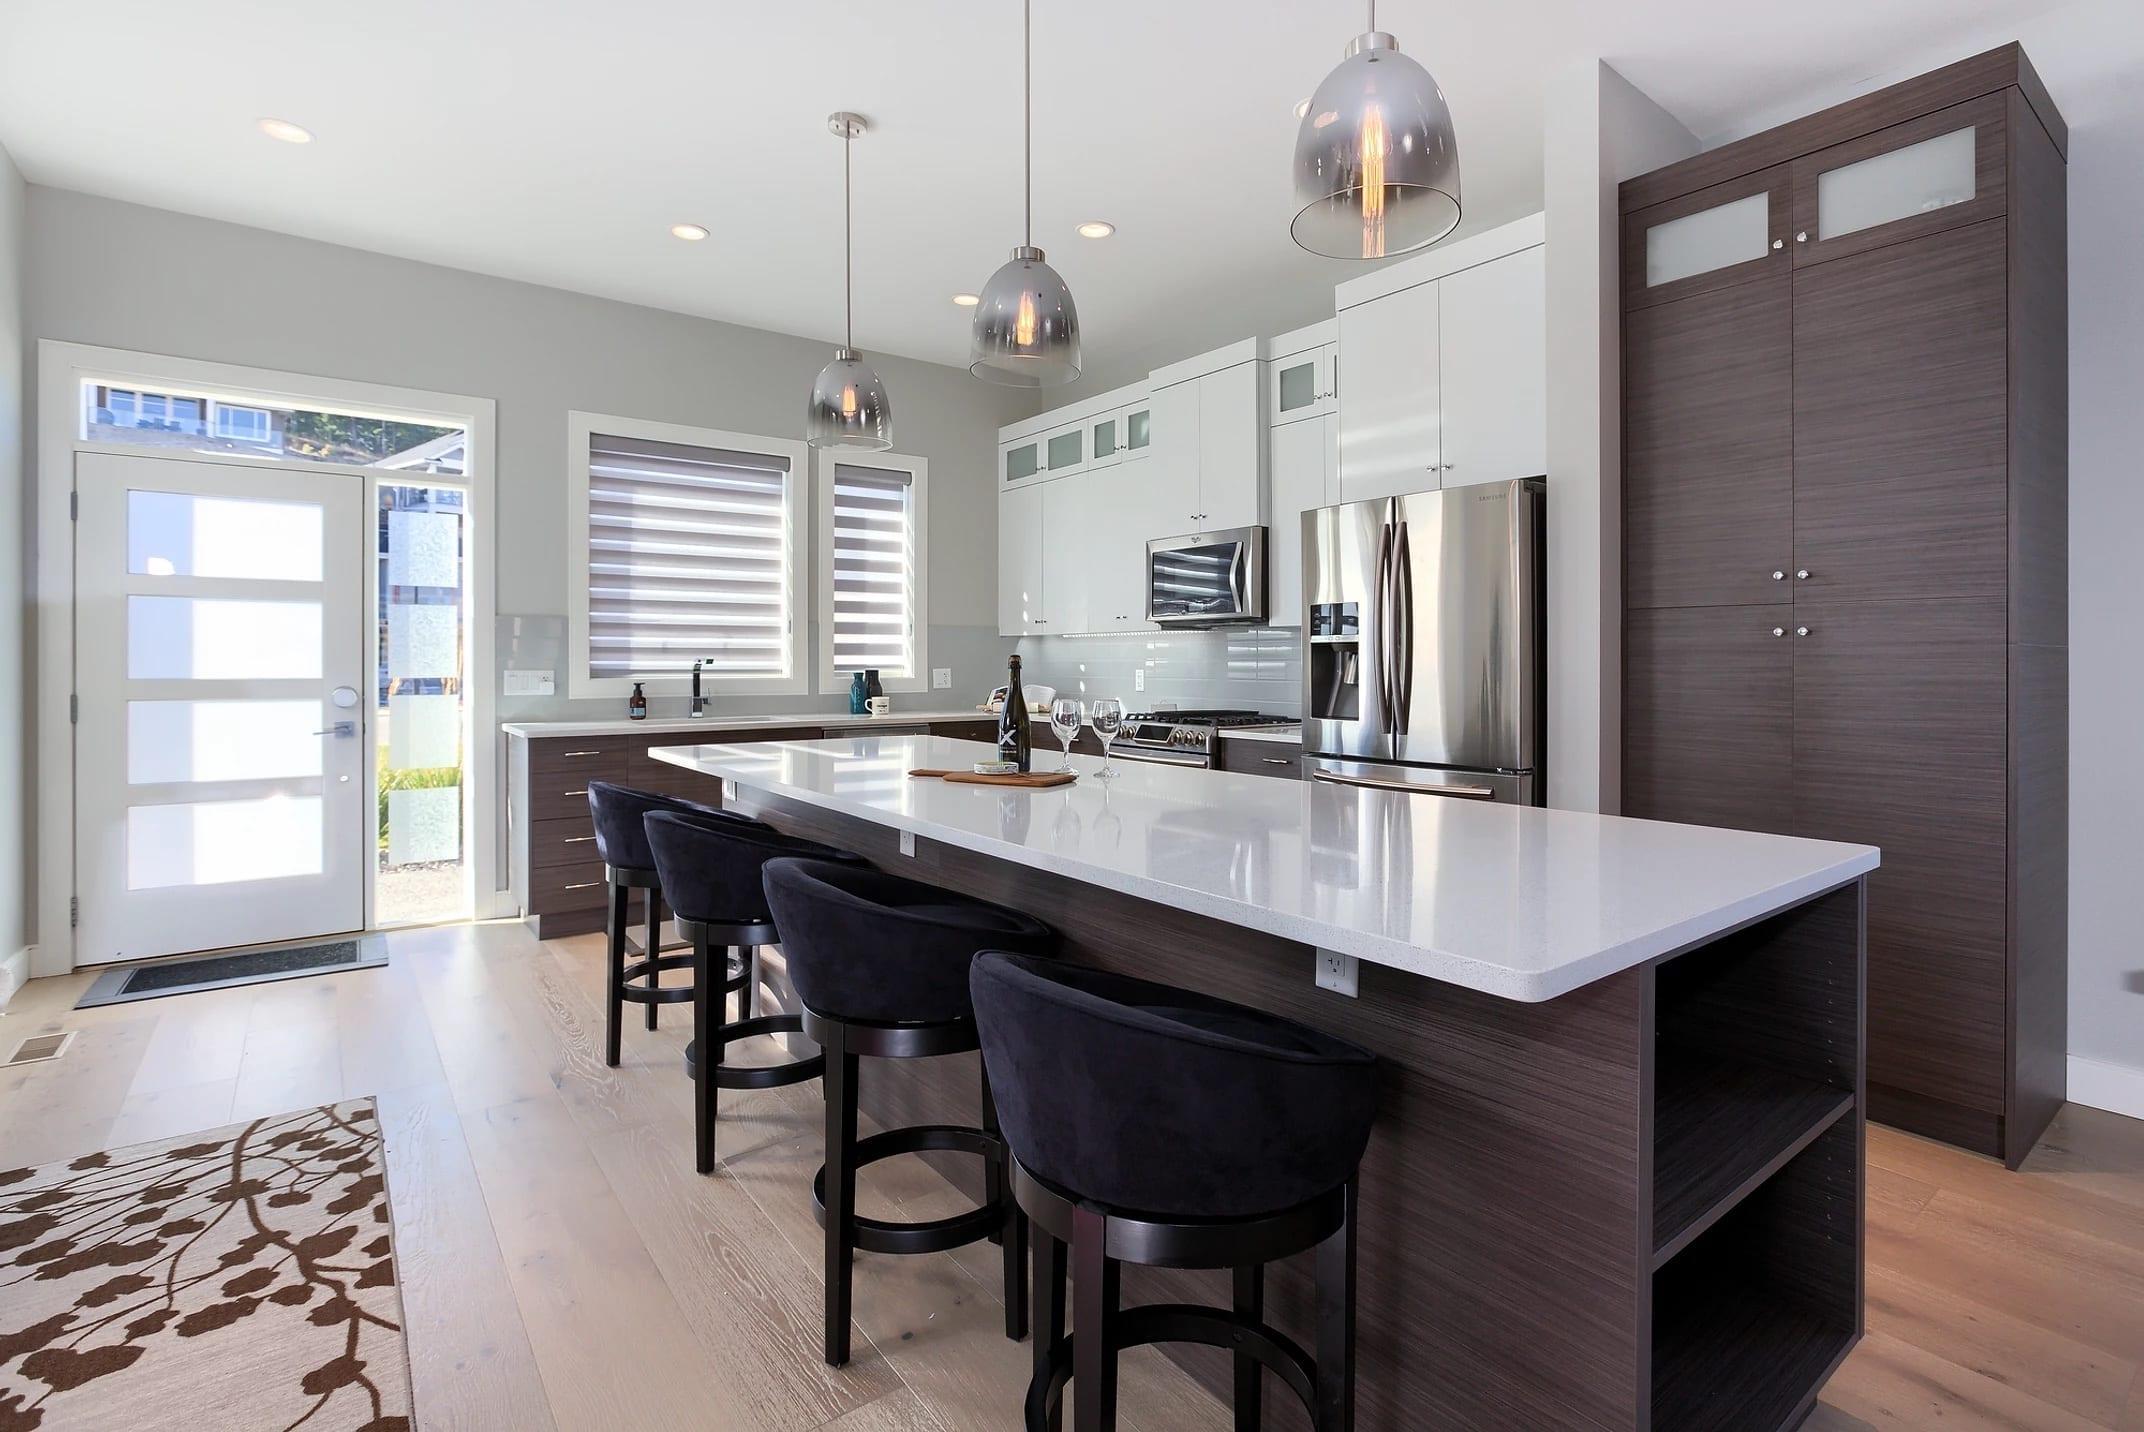 Dunbar Villas contemporary kitchen, built by Impact Builders